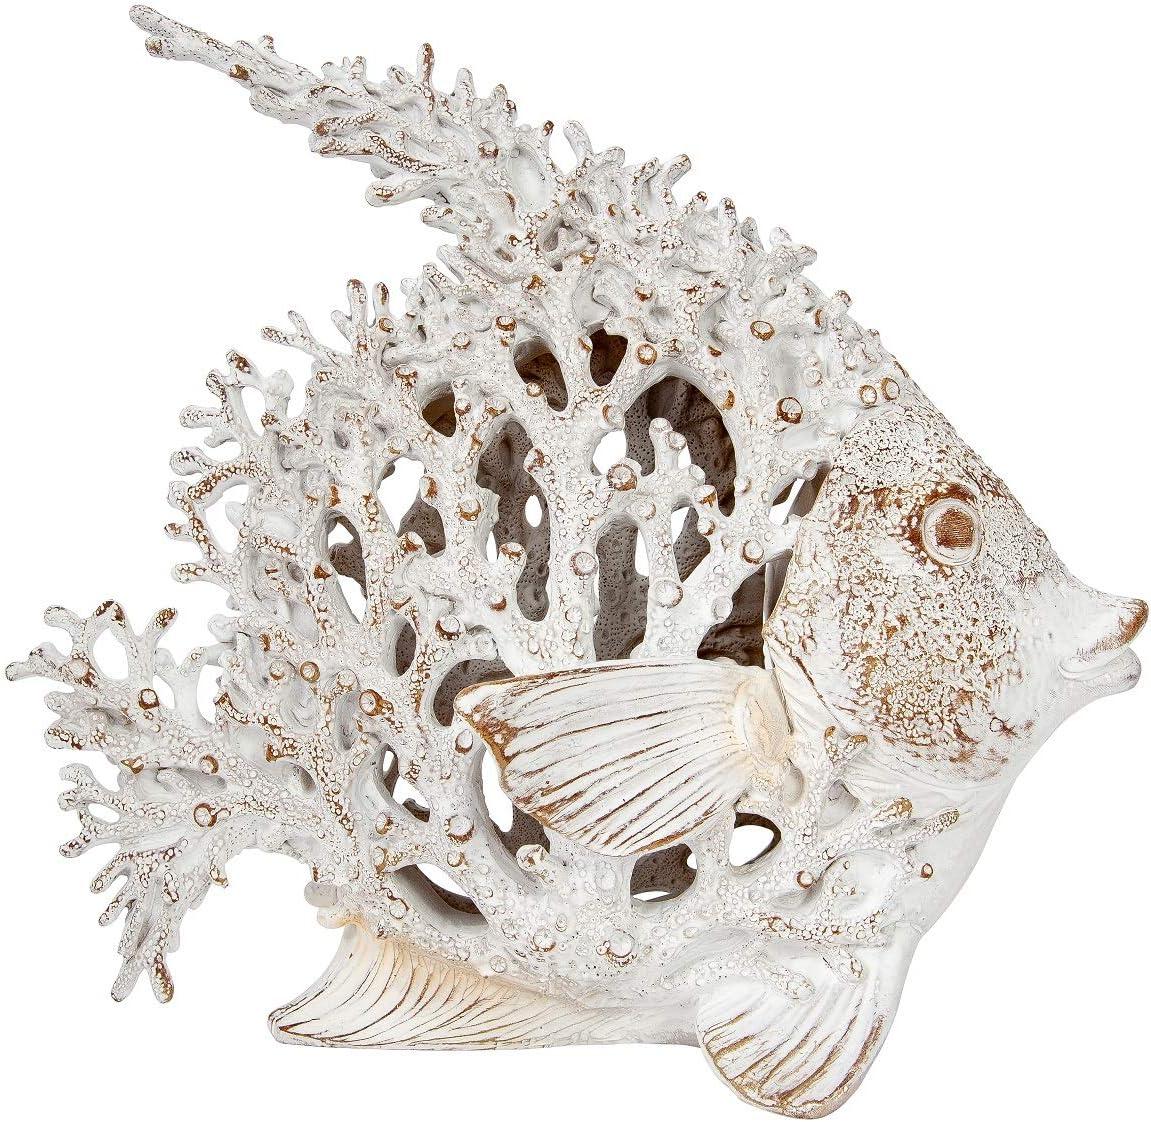 DeJon Fish Unique White Coral Look Angelfish Table Top Collectible Figurine 10